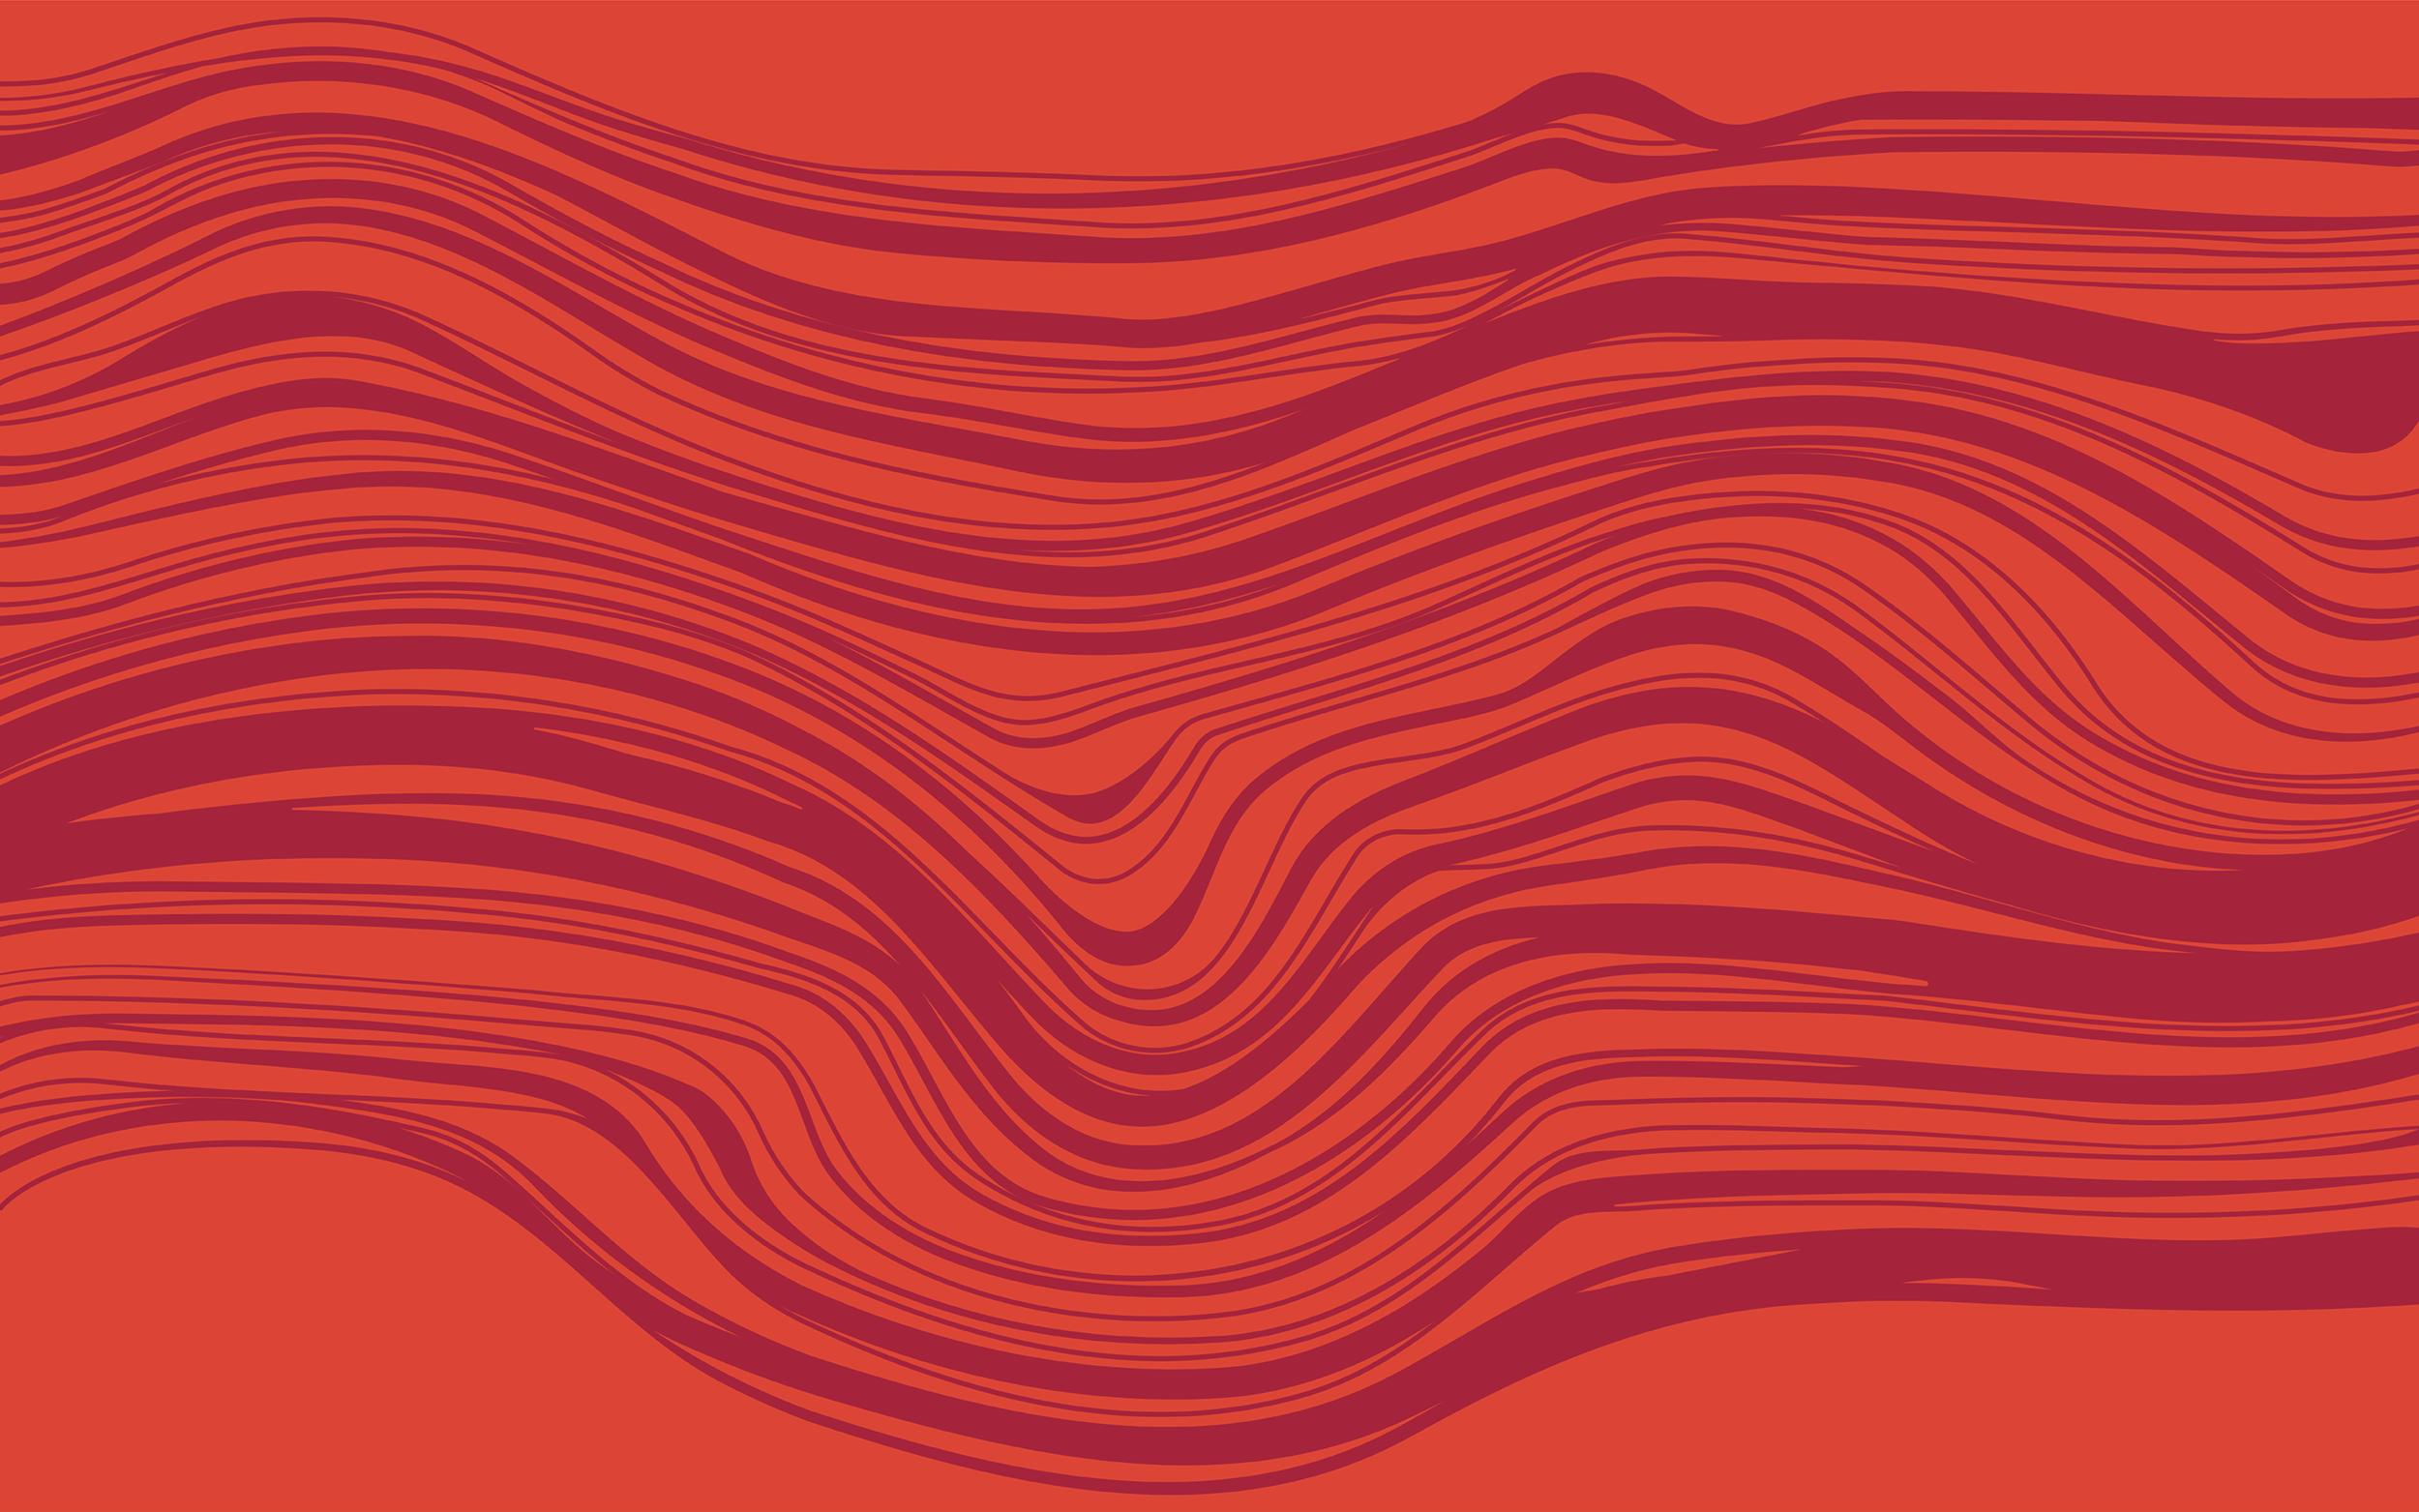 WildManor_Pattern_Final-03_LOW.png